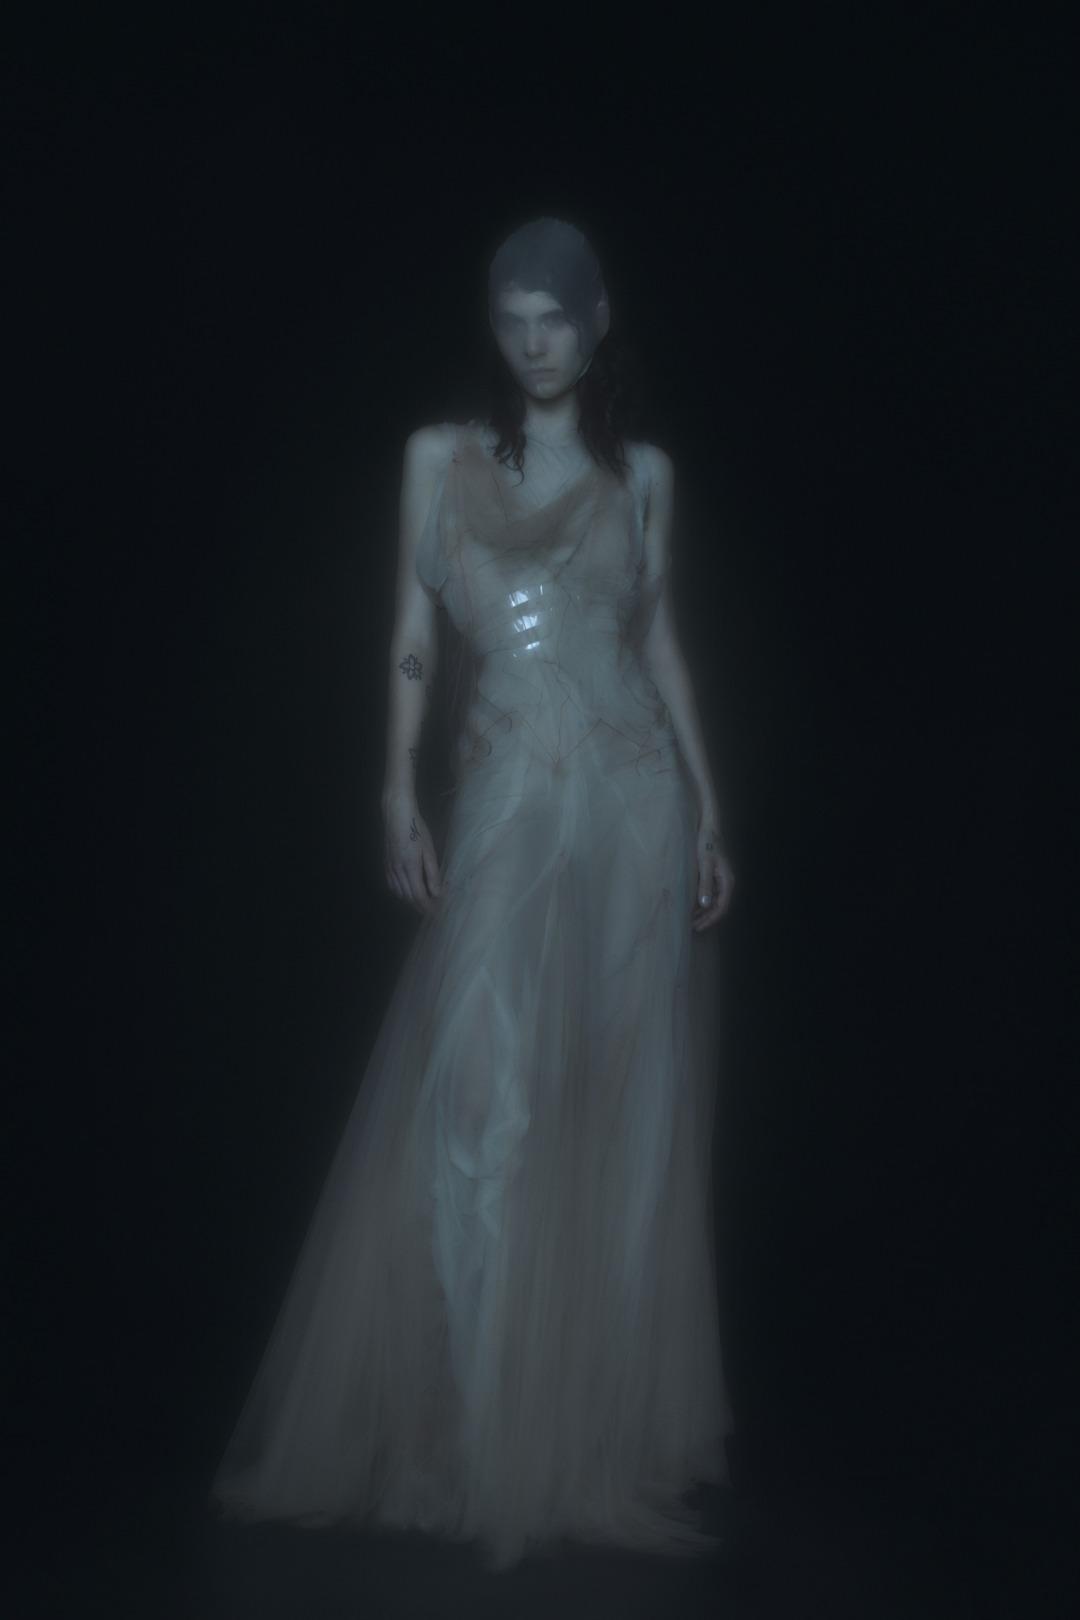 2020-21 Sonbahar/Kış Couture